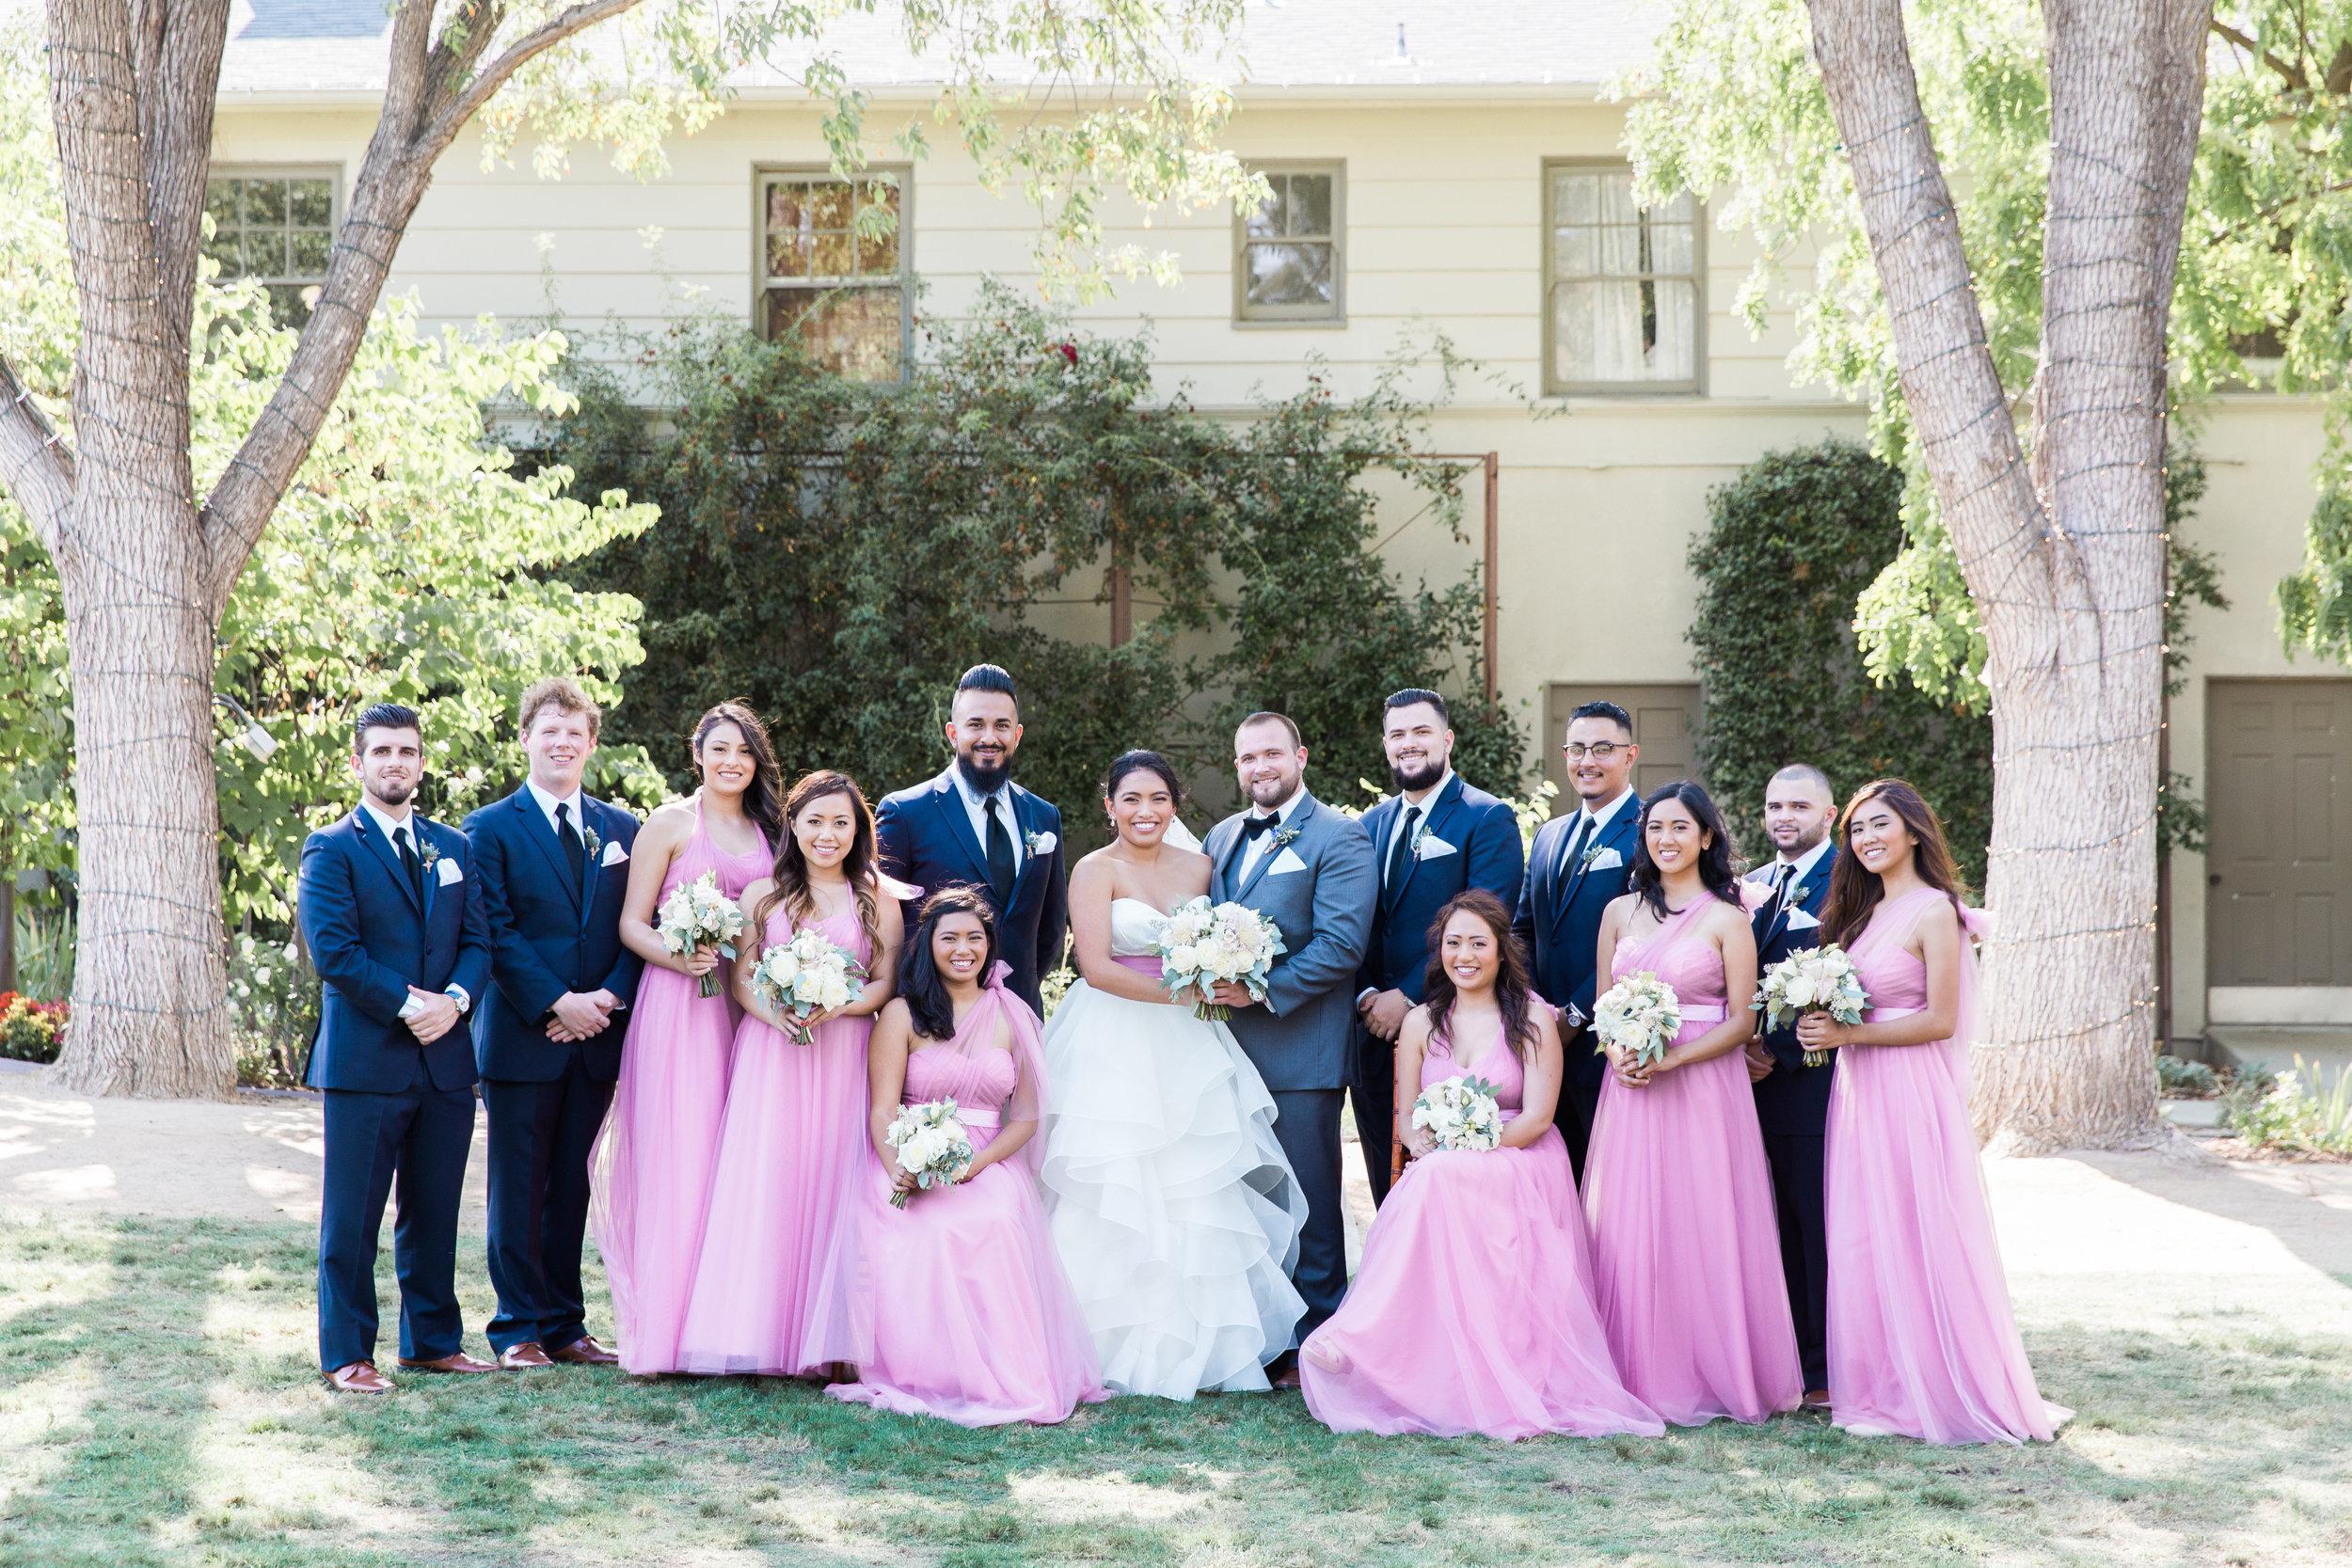 Patty-Aaron-Wedding-164.jpg